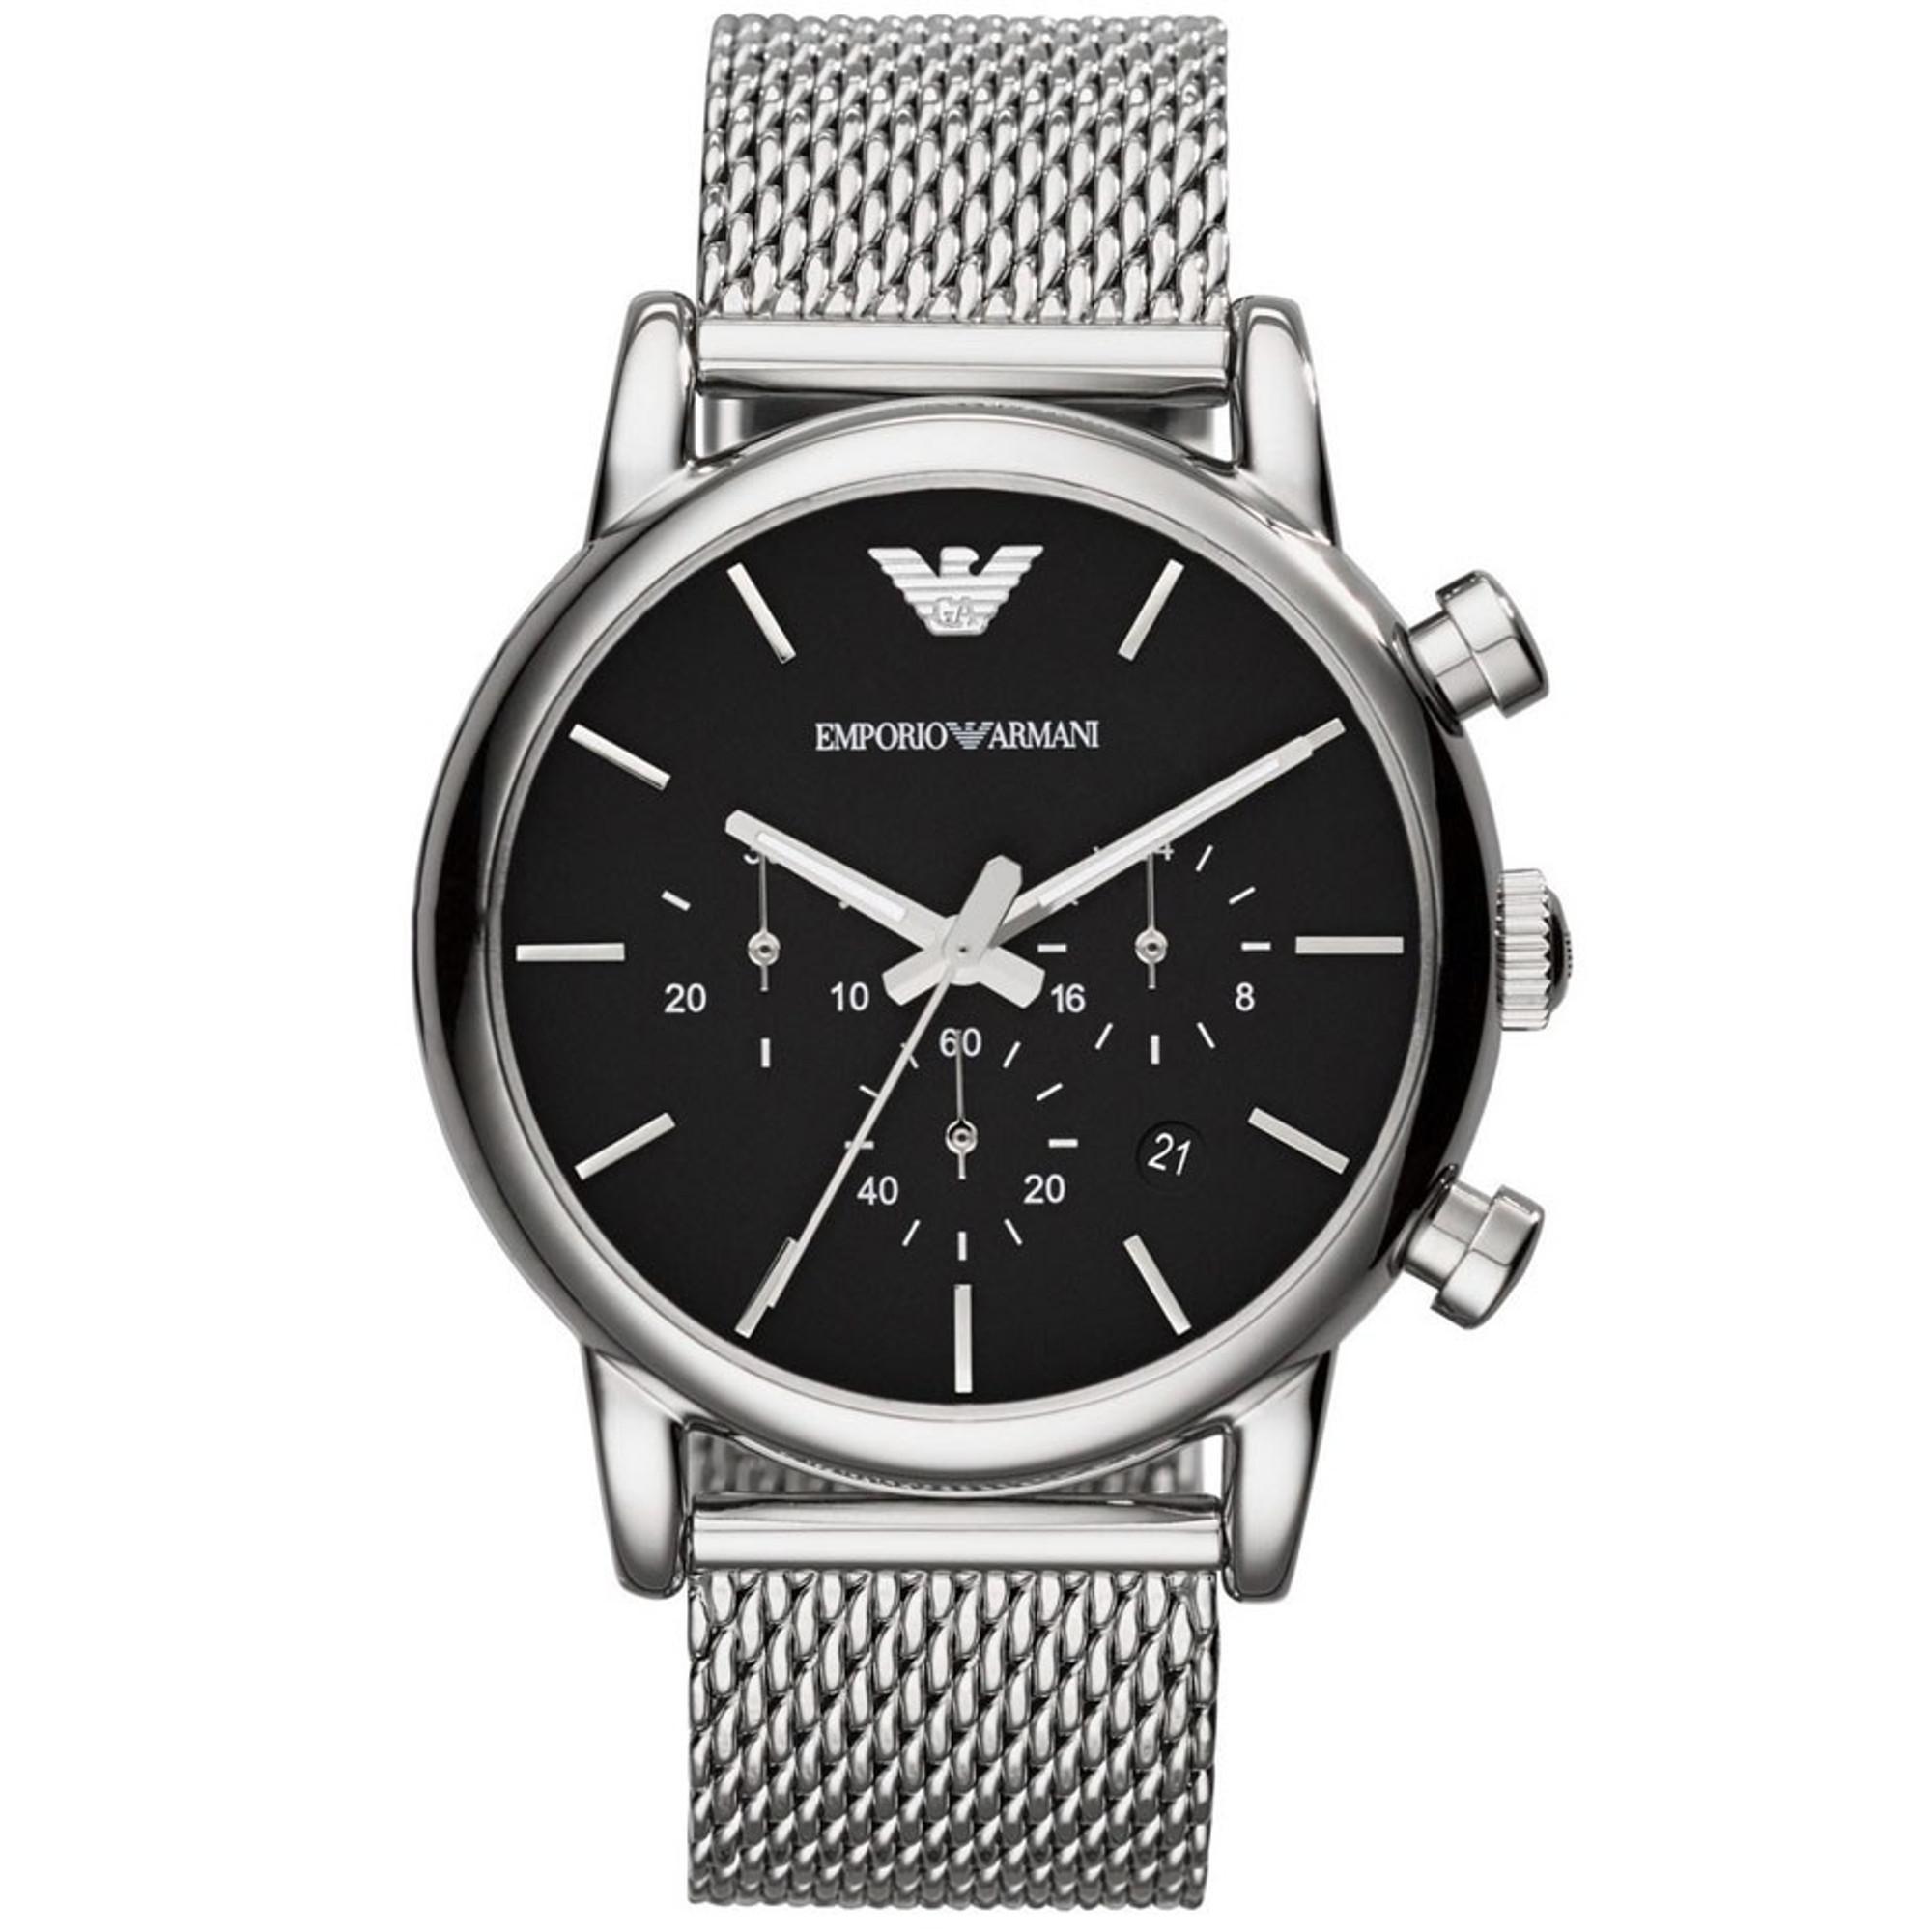 EMPORIO ARMANI Classic Watch Chronograph AR1811